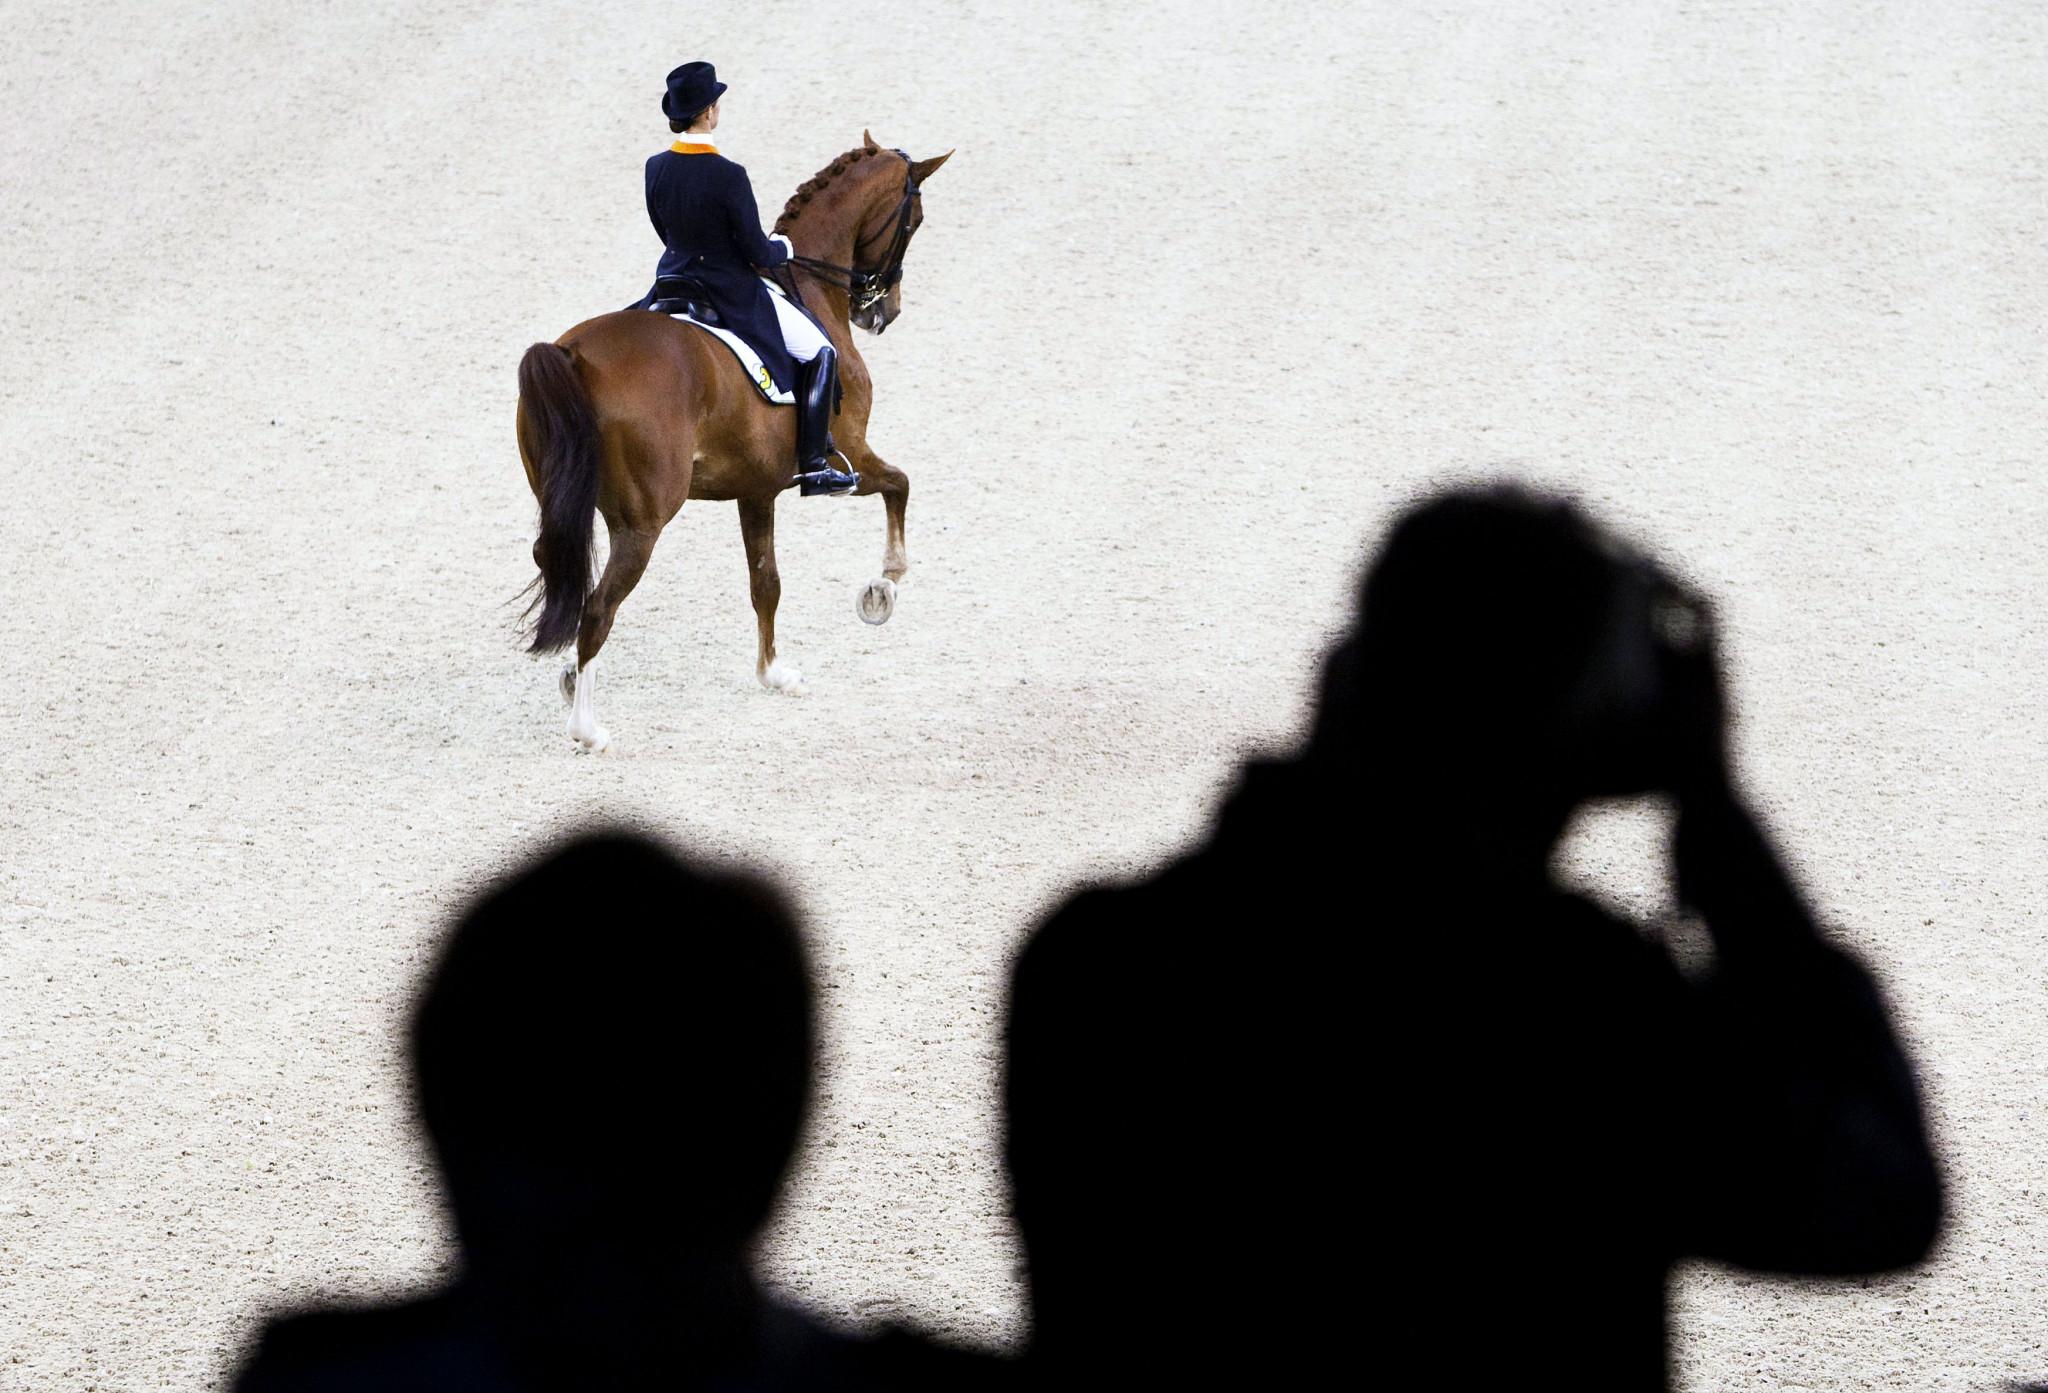 Dutch dressage rider's Tokyo 2020 hopes dashed by administrative error